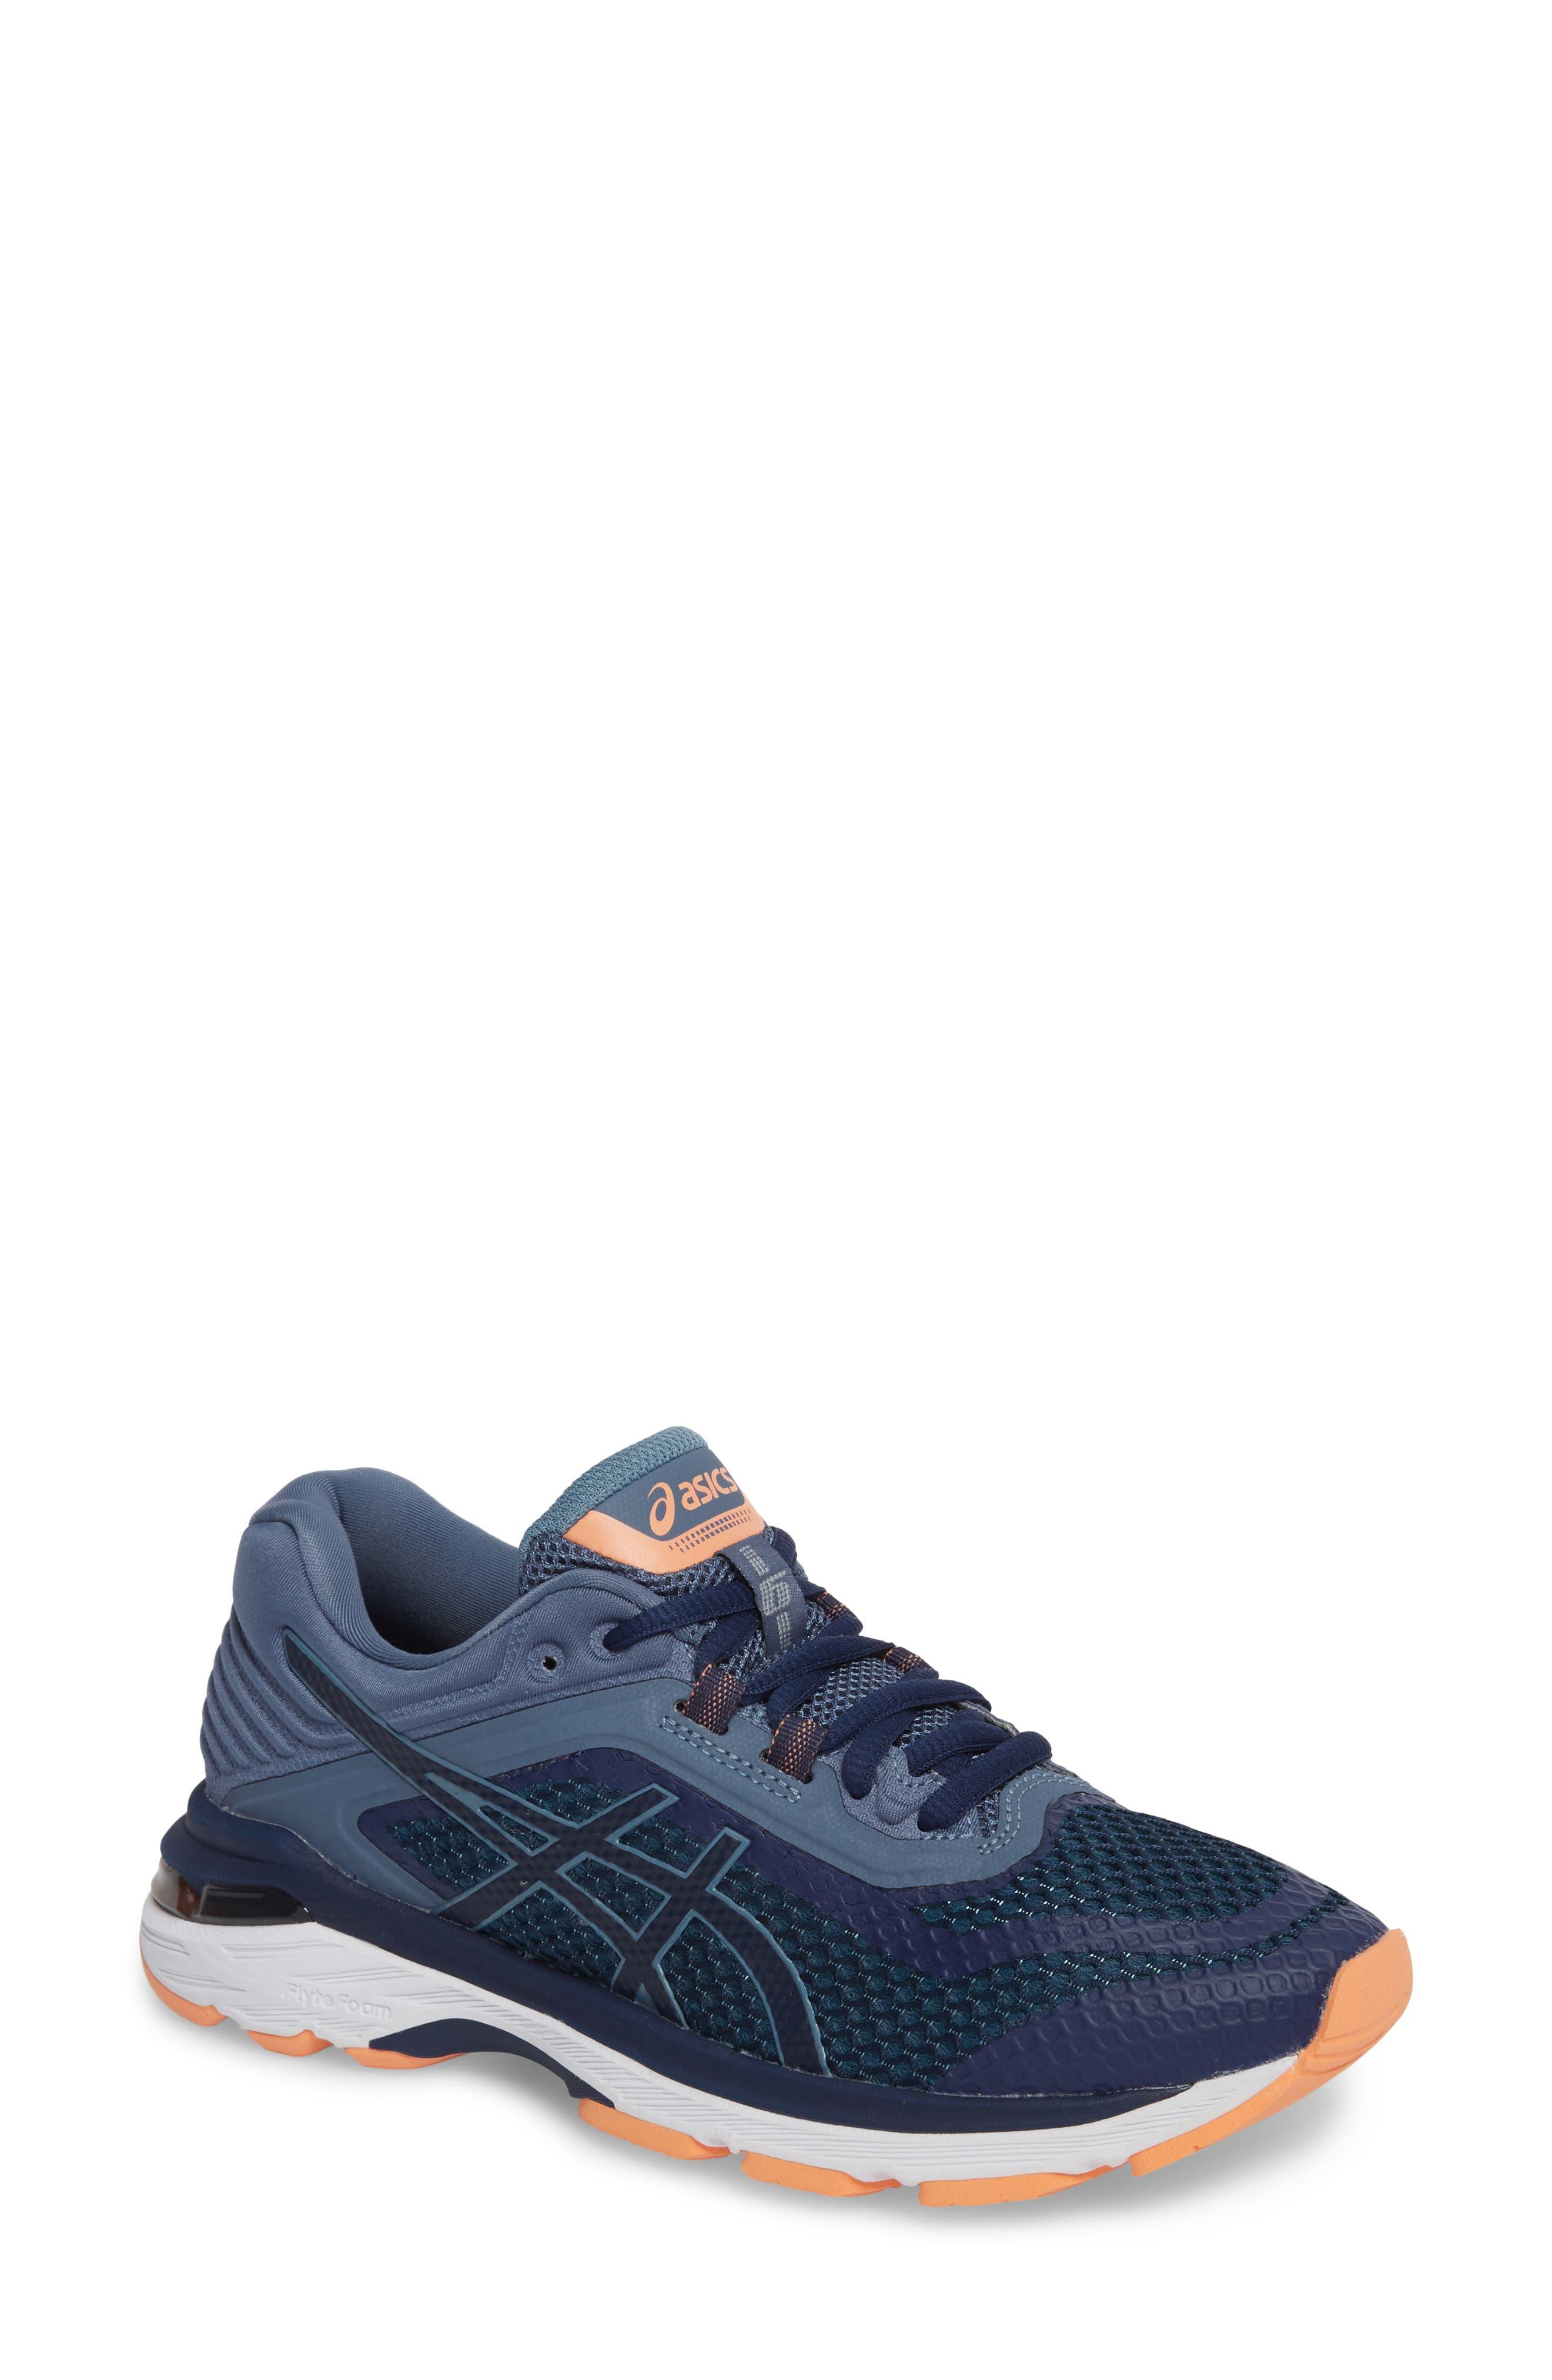 GT-2000 6 Running Shoe,                             Main thumbnail 1, color,                             Indigo Blue/ Smoke Blue